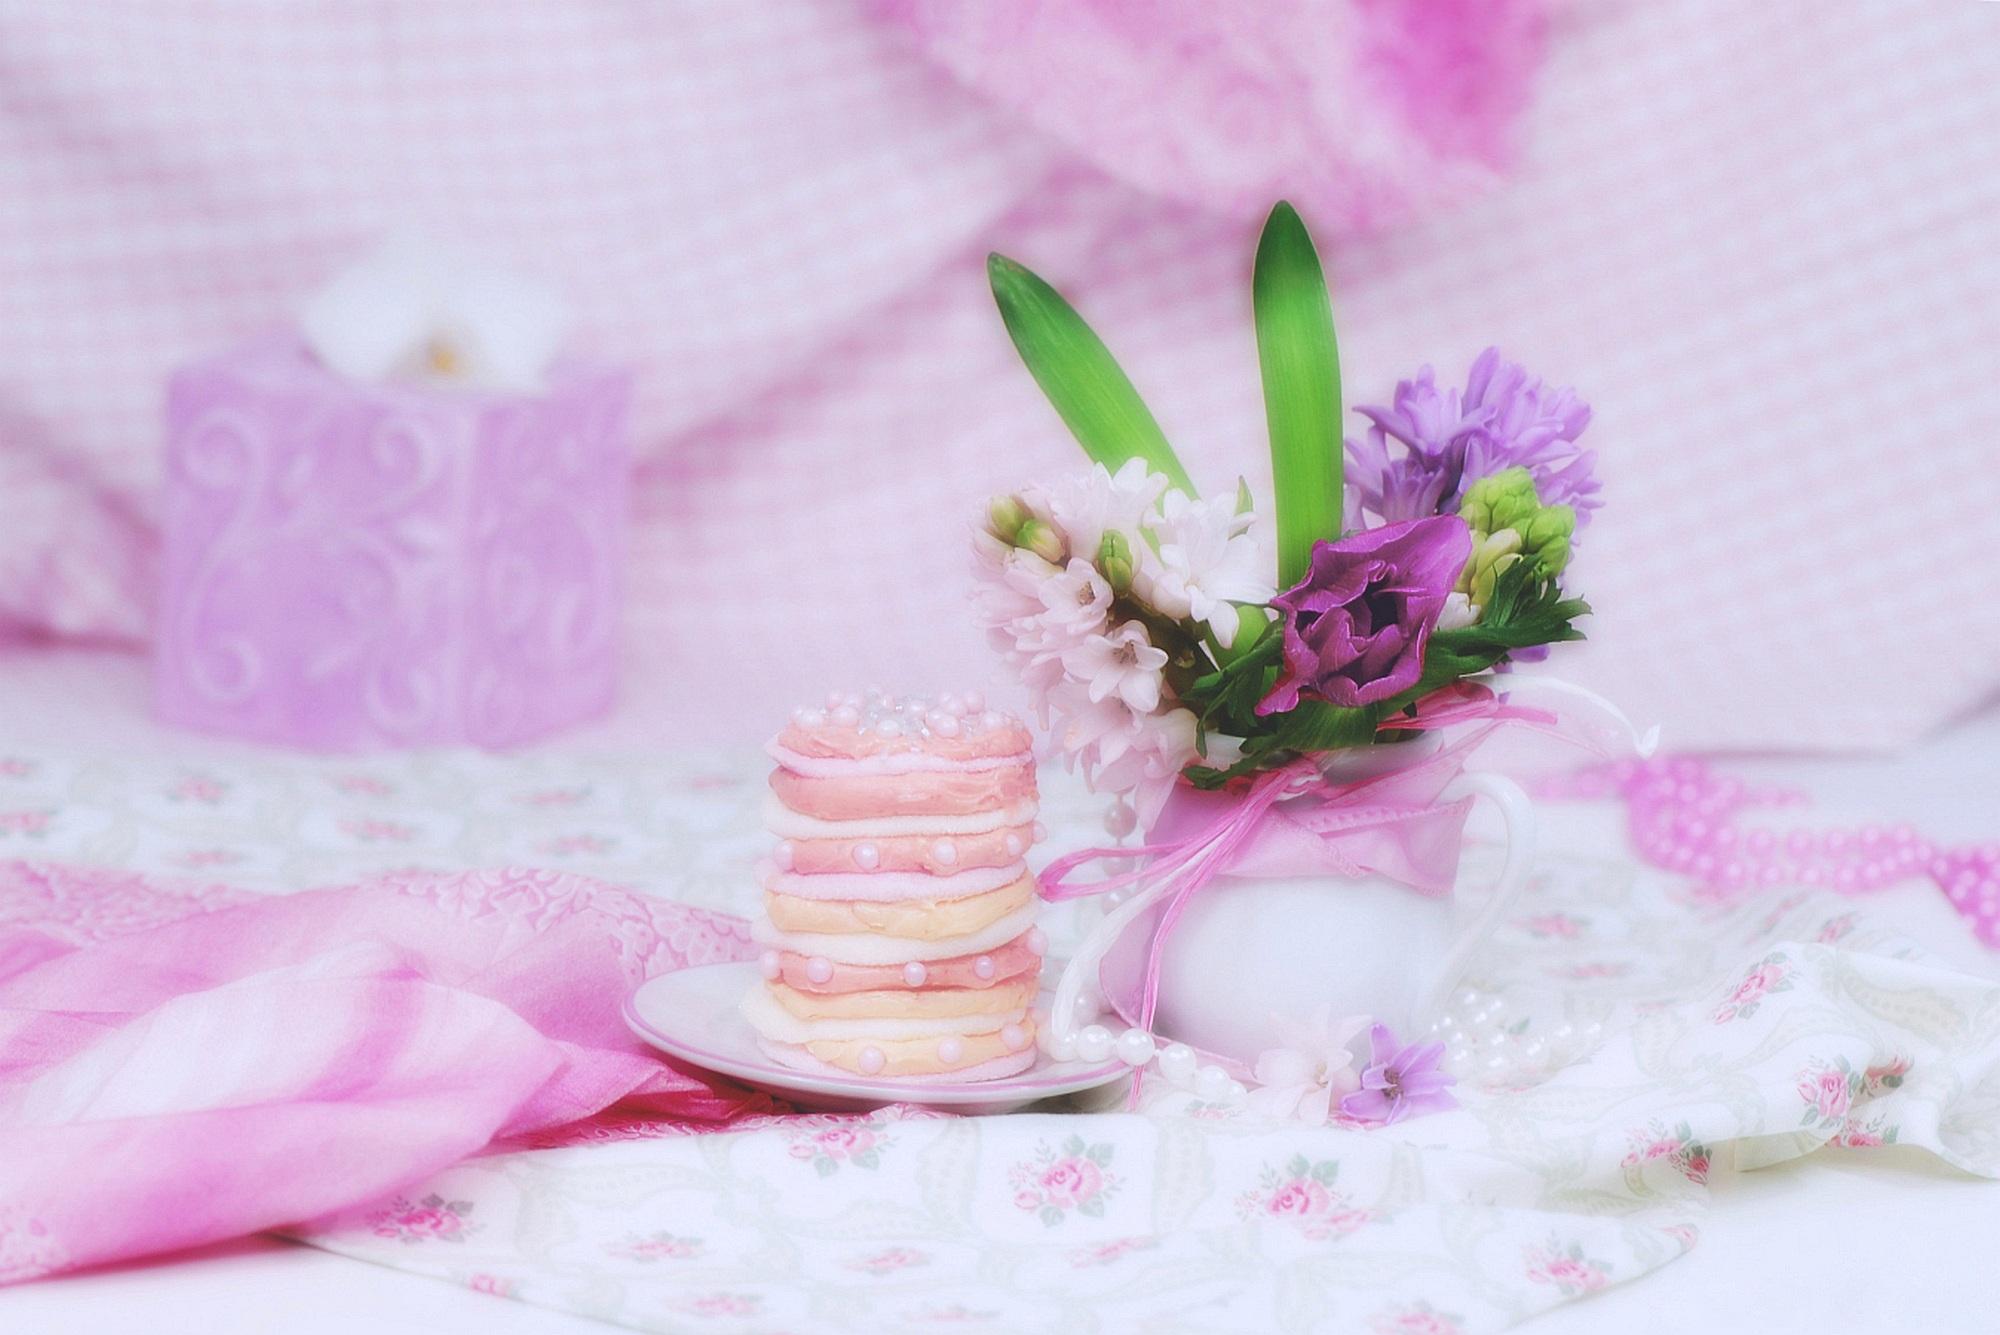 Free Images Sweet Purple Petal Restaurant Vase Meal Food